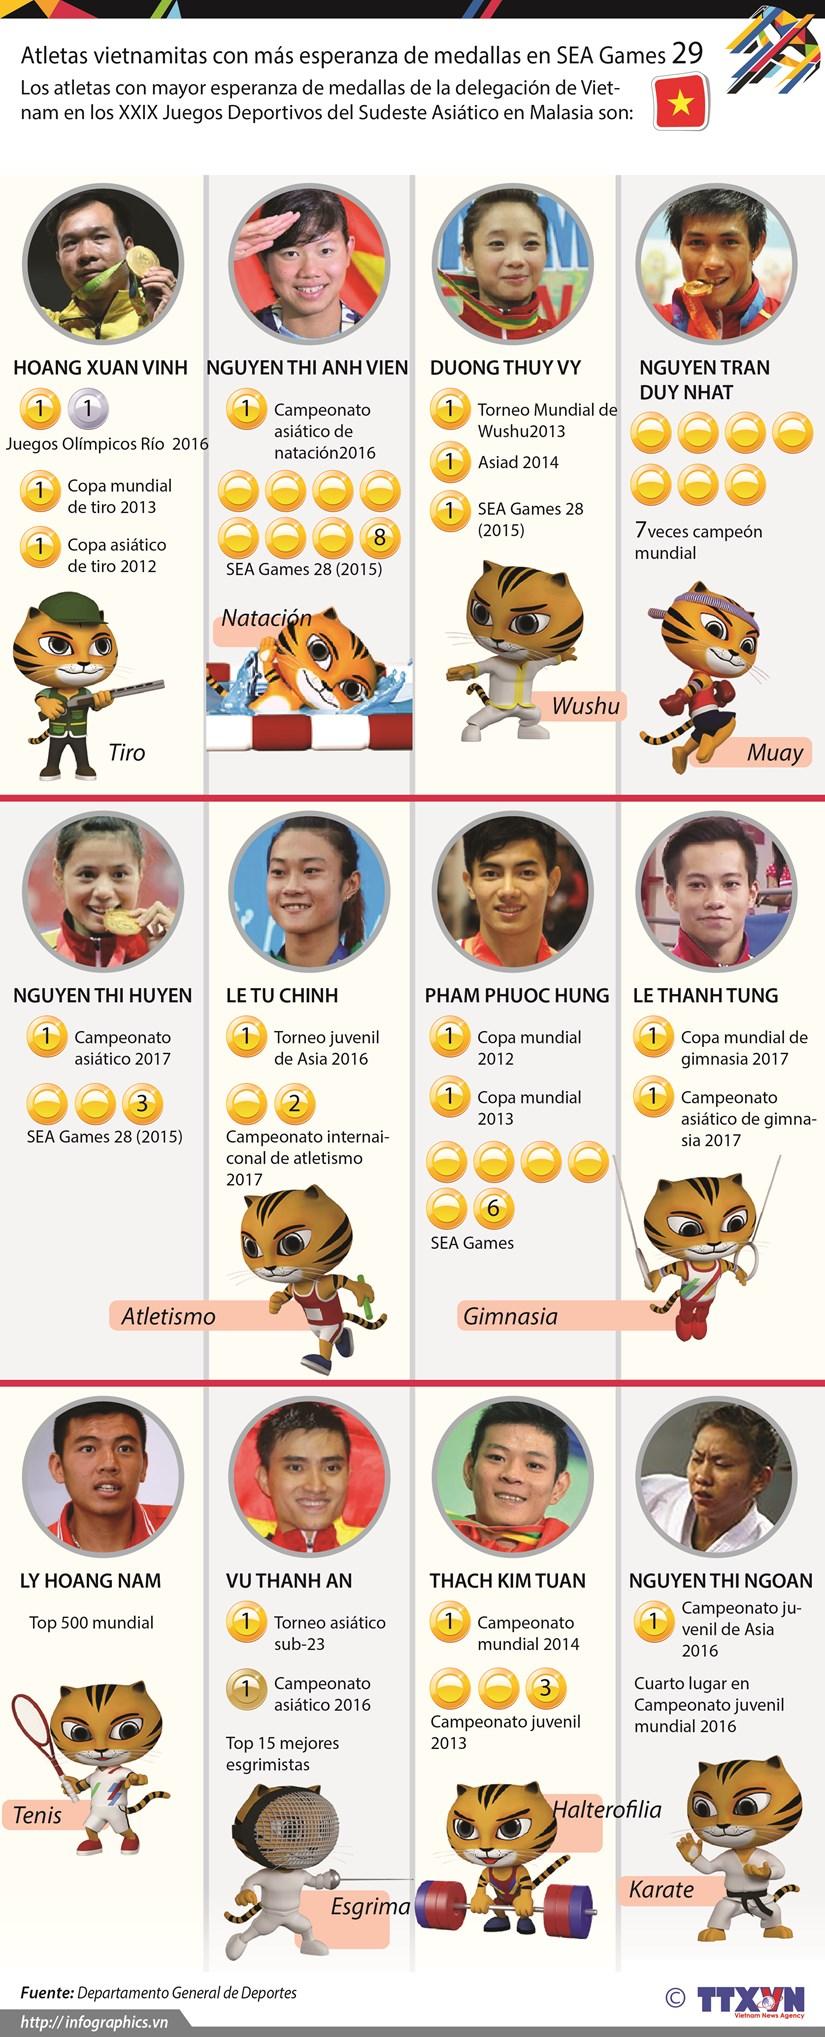 [Infografia] Atletas vietnamitas con mas esperanza de medallas en SEA Games 29 hinh anh 1